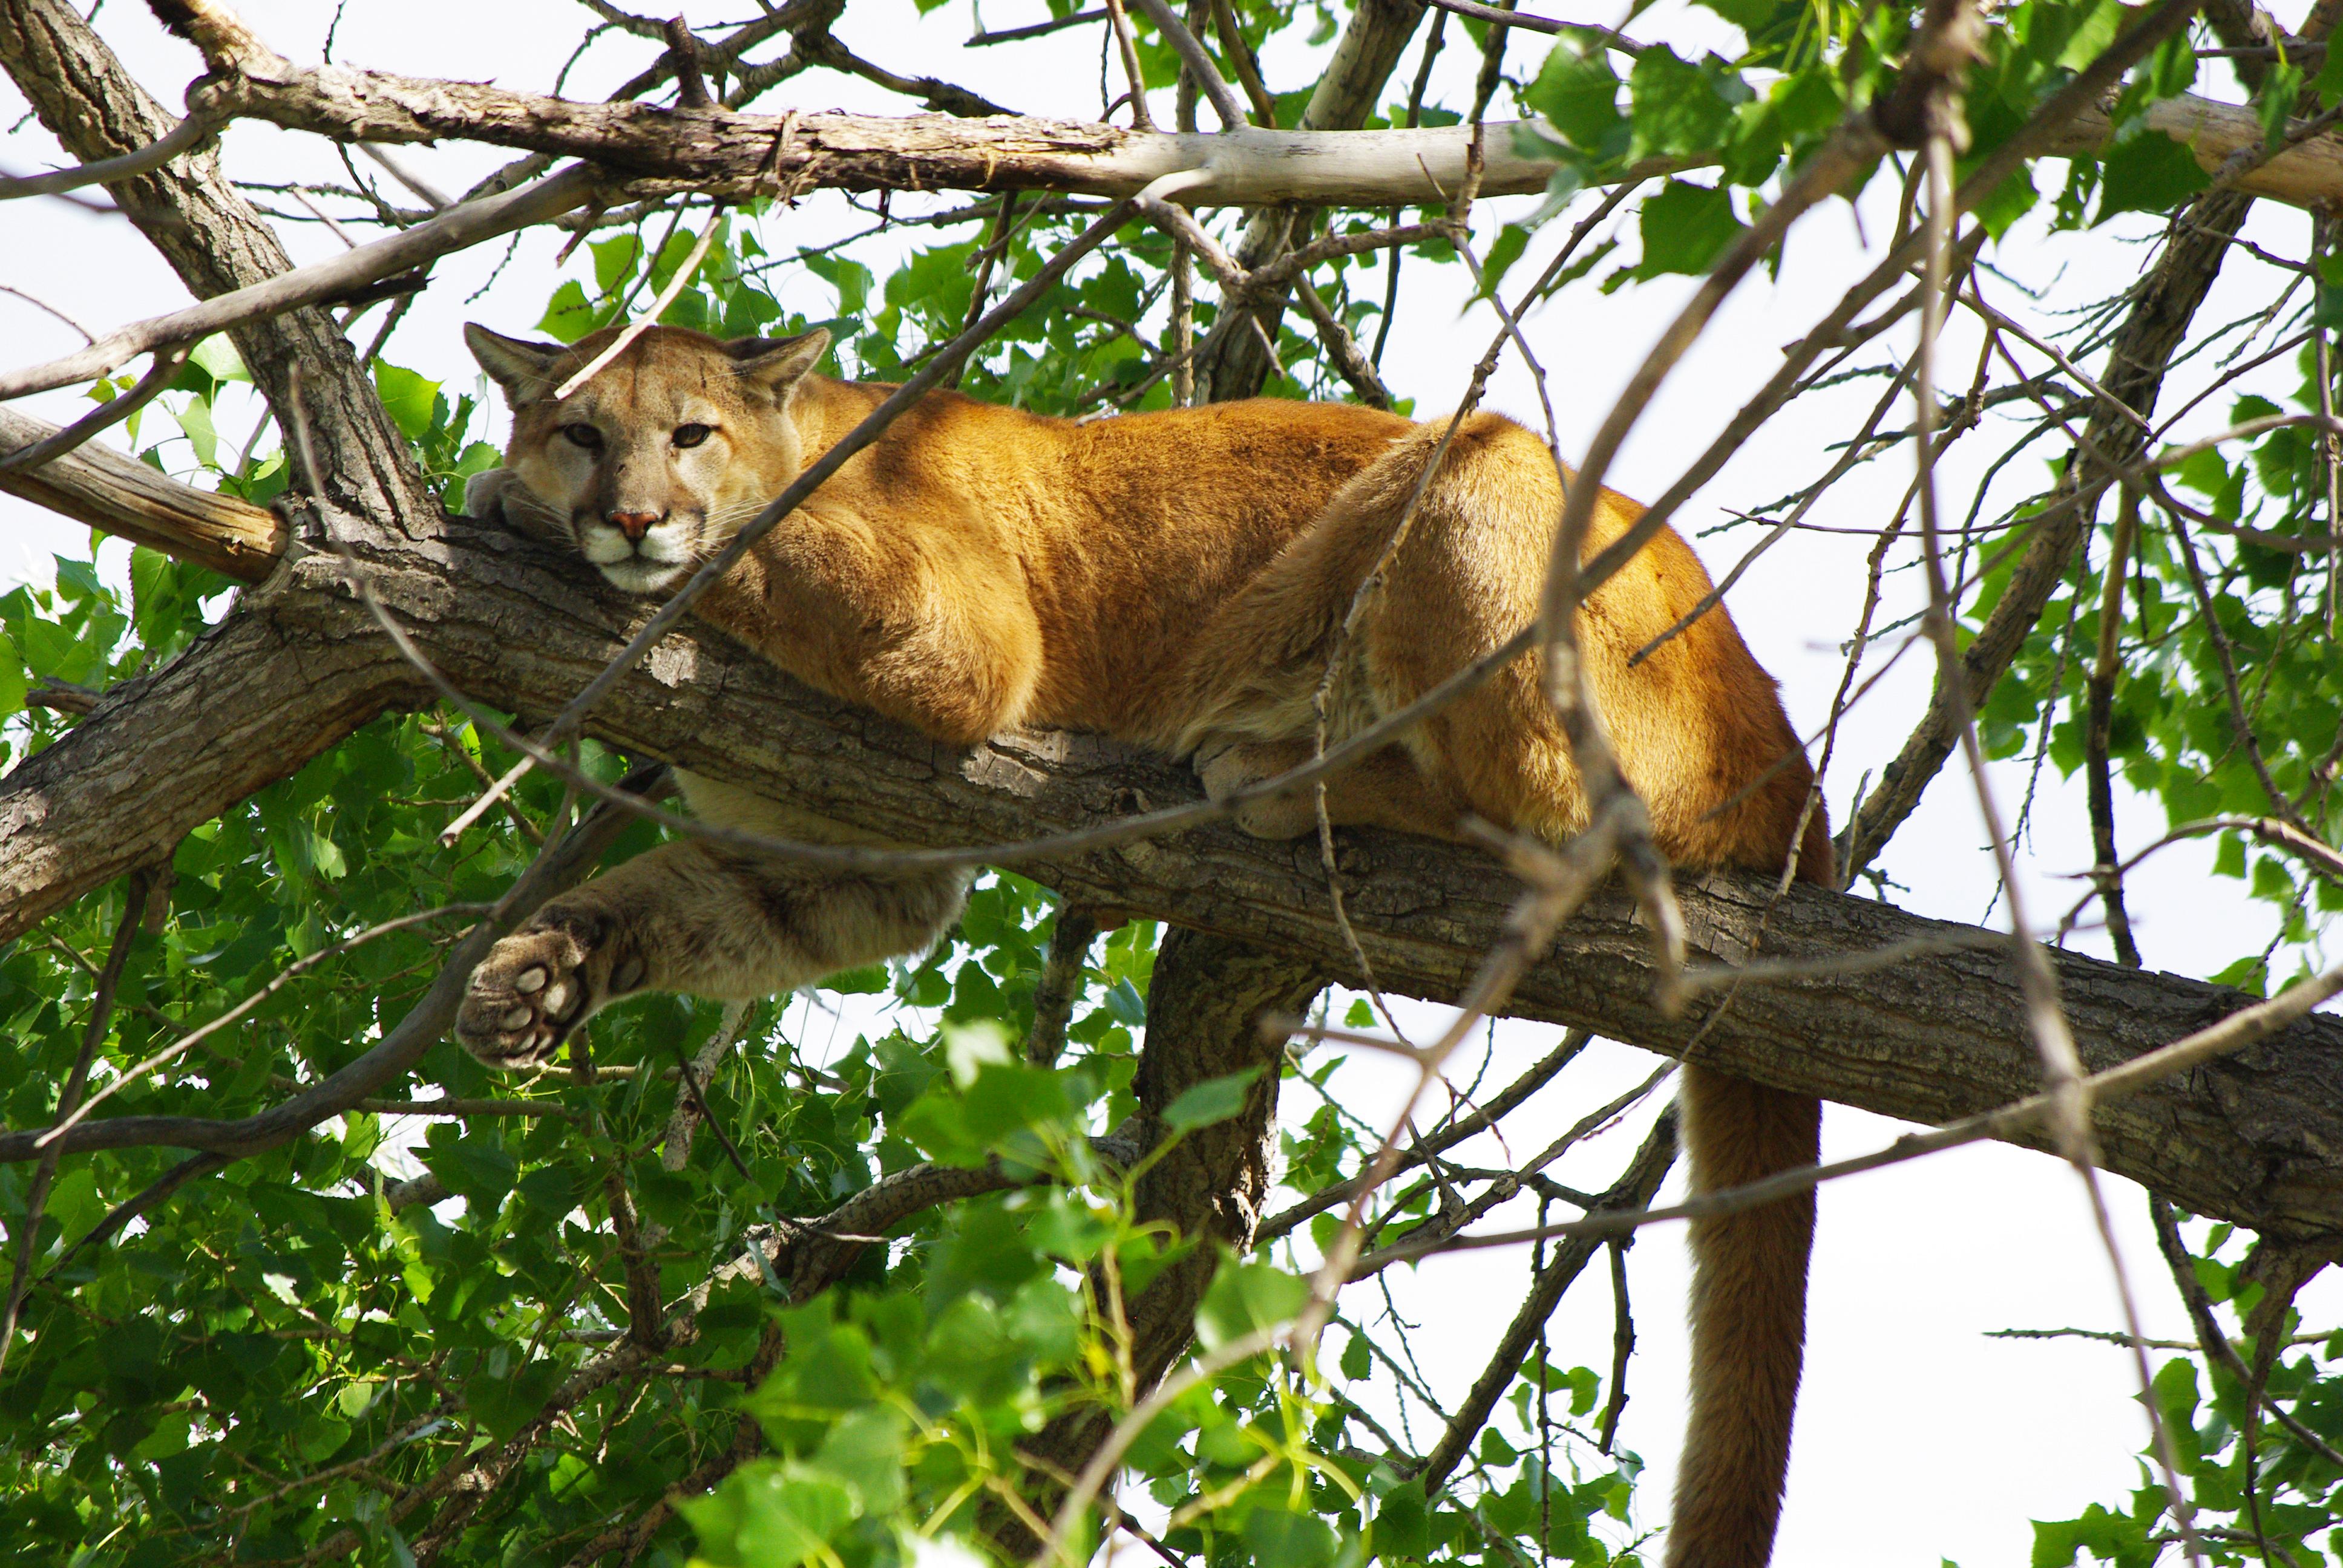 Mountain Lions, Colorado, big cats, wildlife, conservation, biodiversity, Extinctions, predator killings